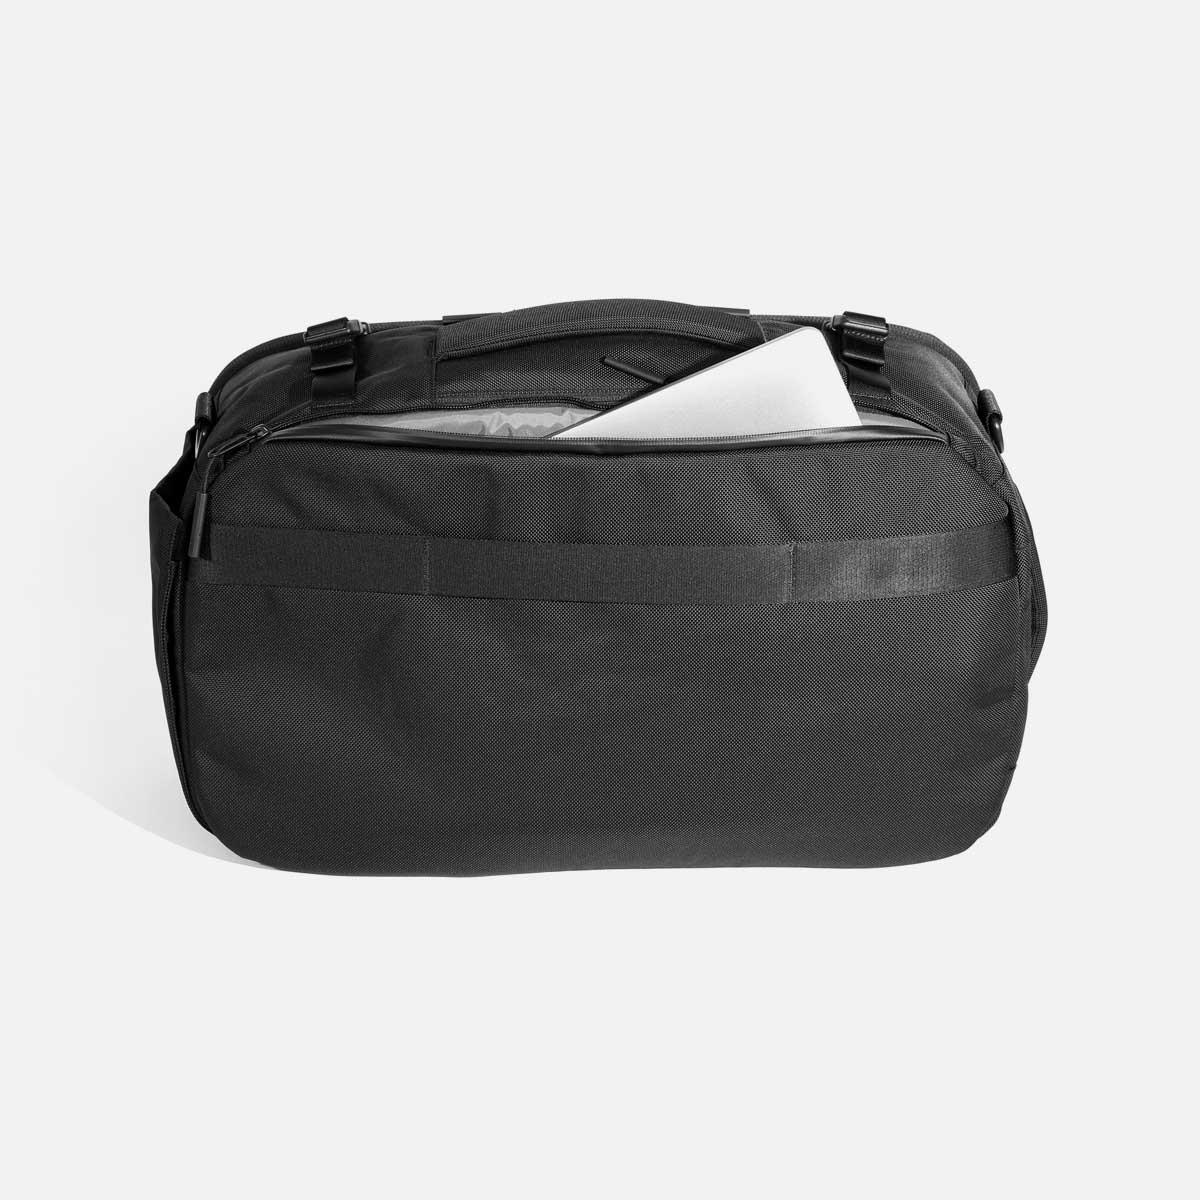 21014_travelduffel_black_laptop.jpg